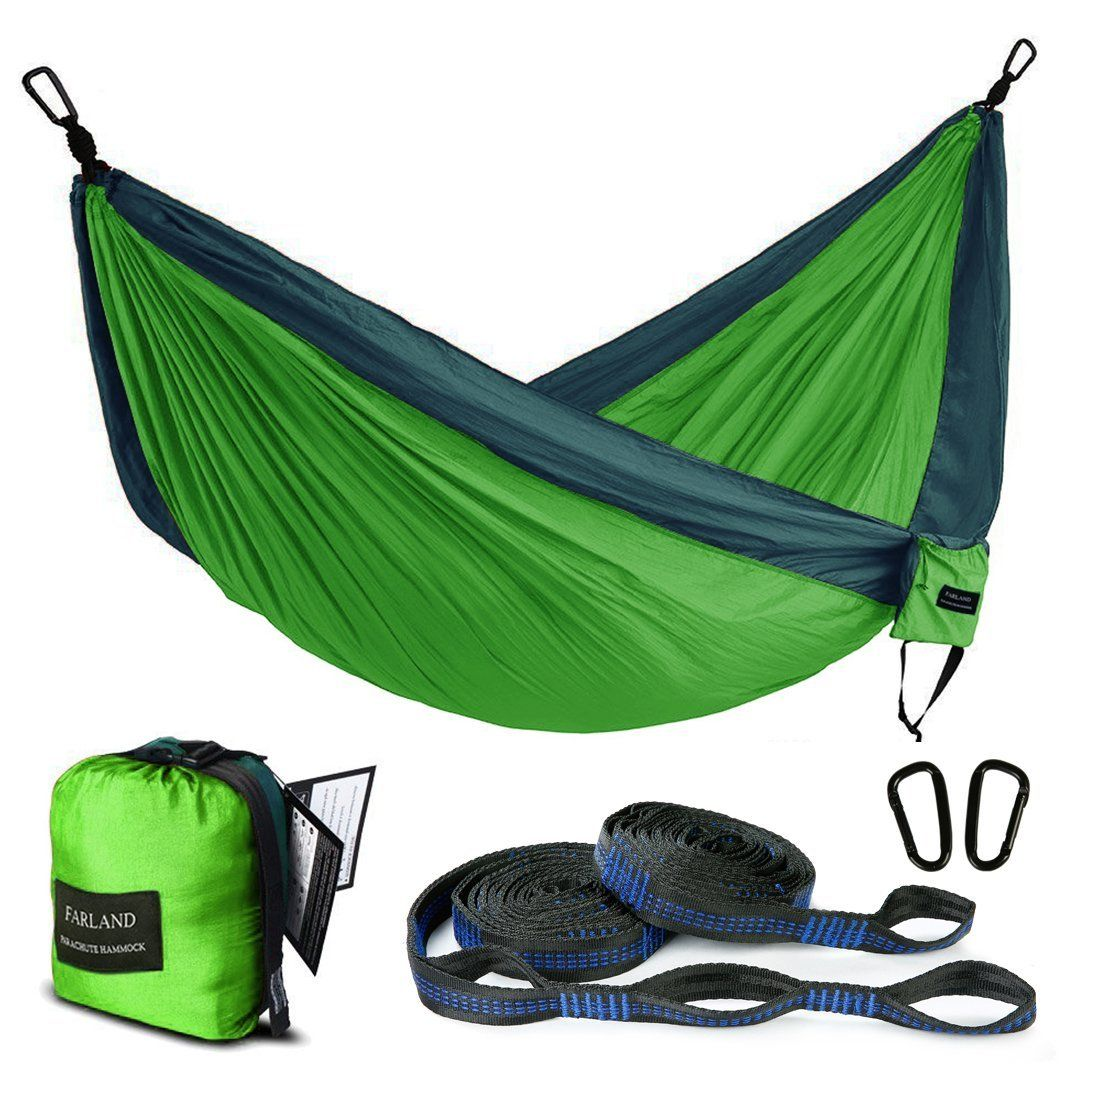 Amazon.com : PASLWSSY Mosquito Net Hammock, Parachute